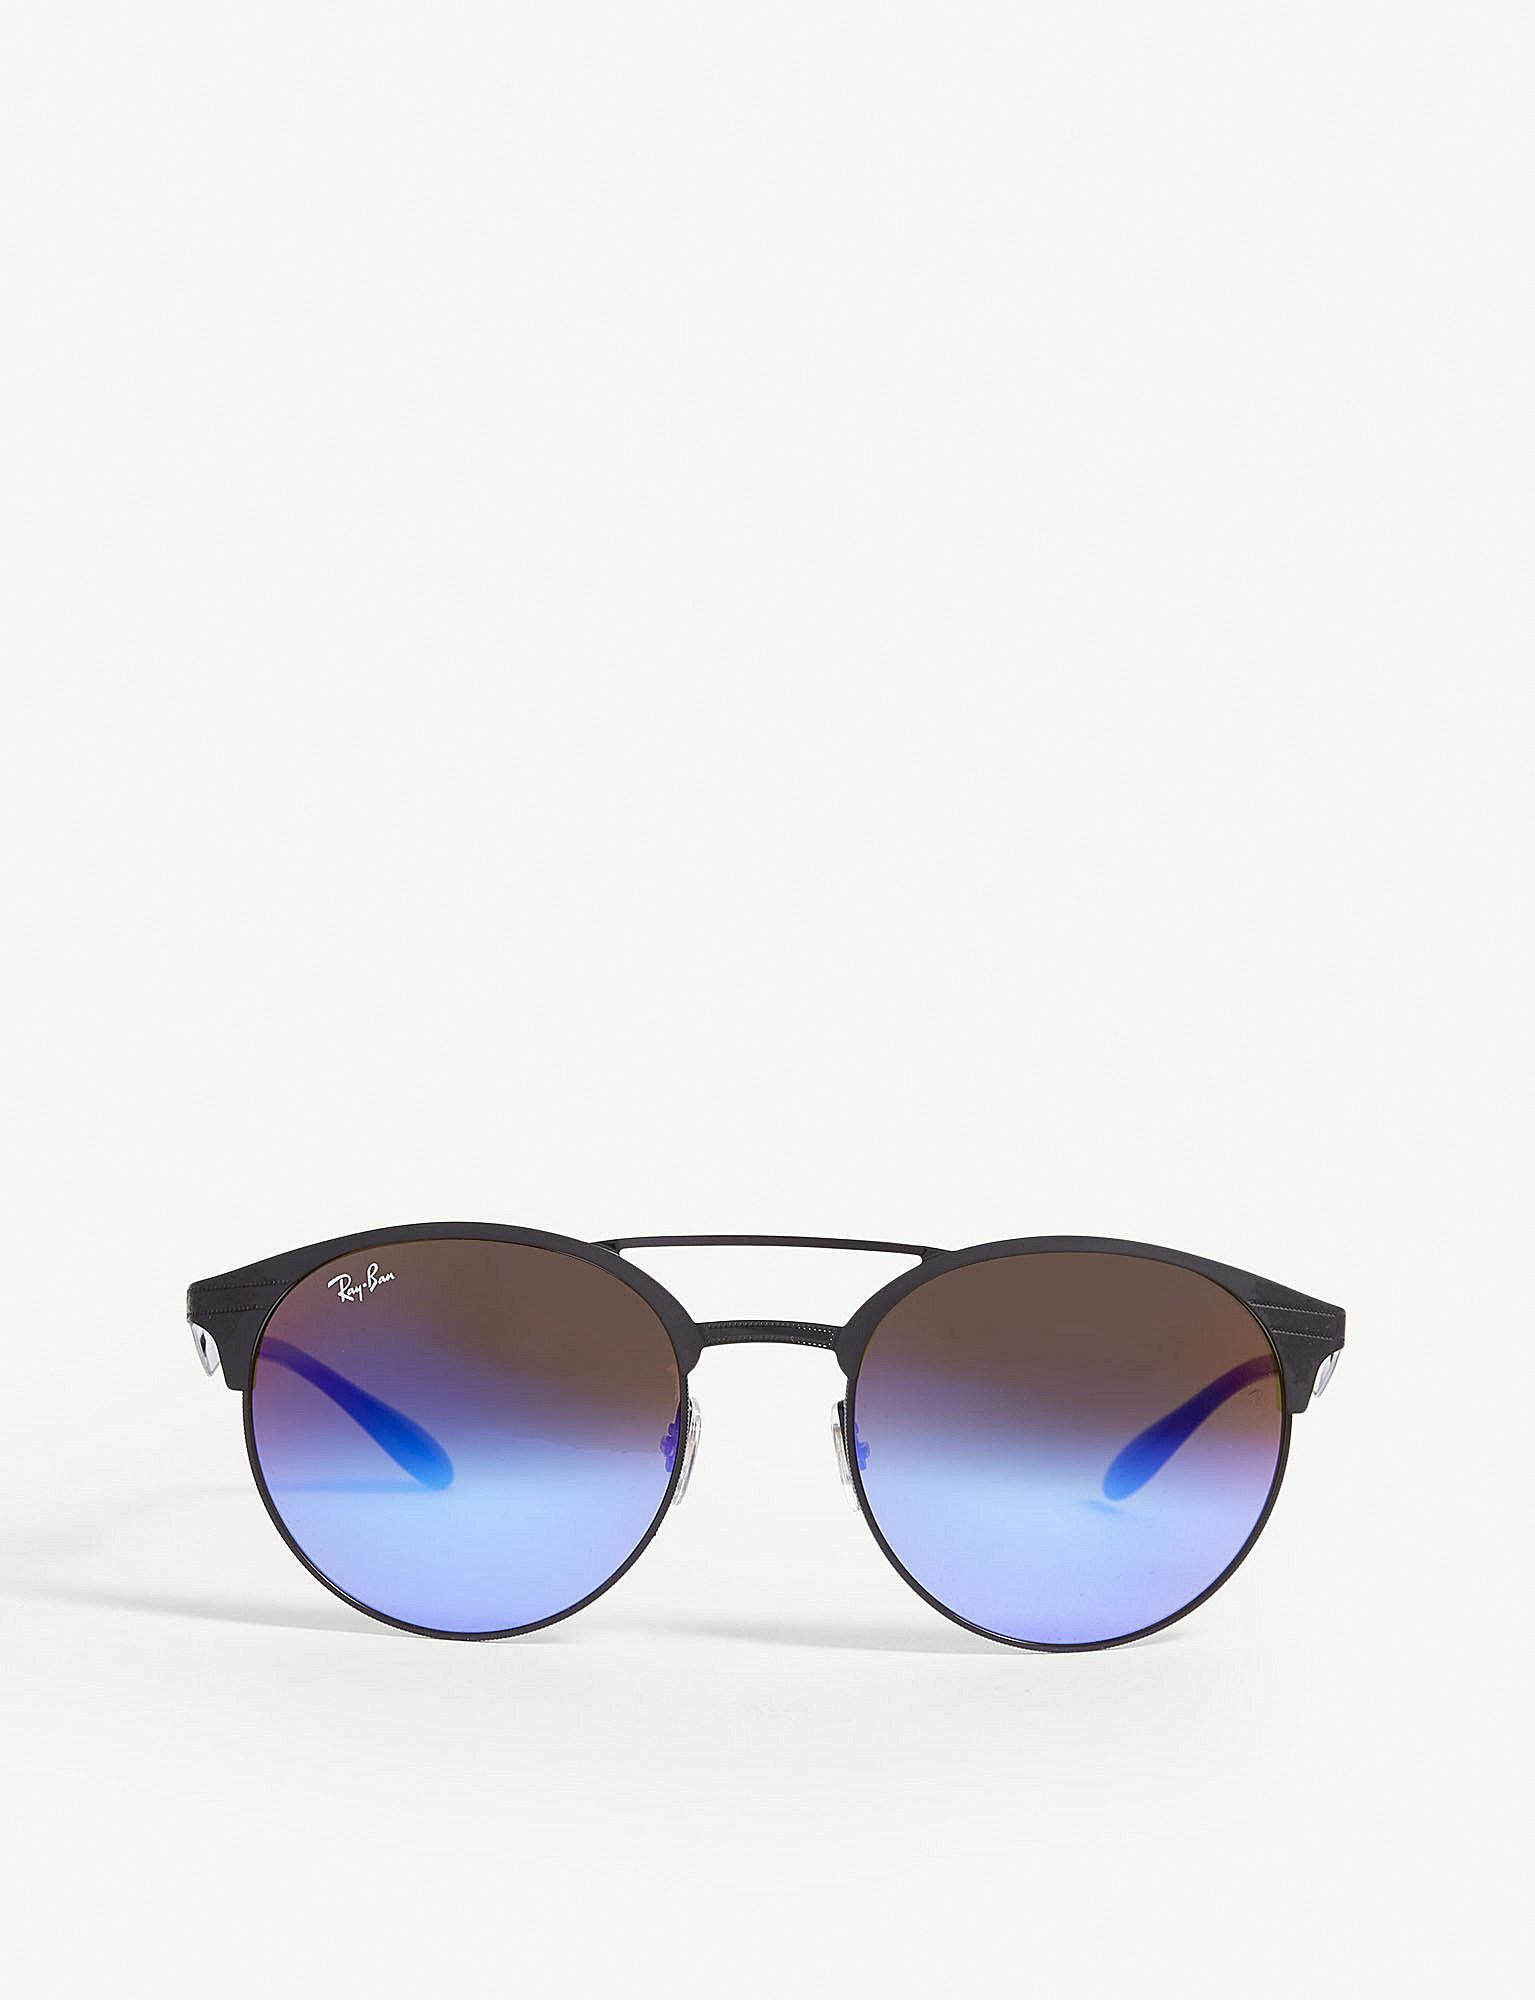 9009223982 Ray-Ban Rb3545 Phantos-frame Sunglasses in Black - Lyst